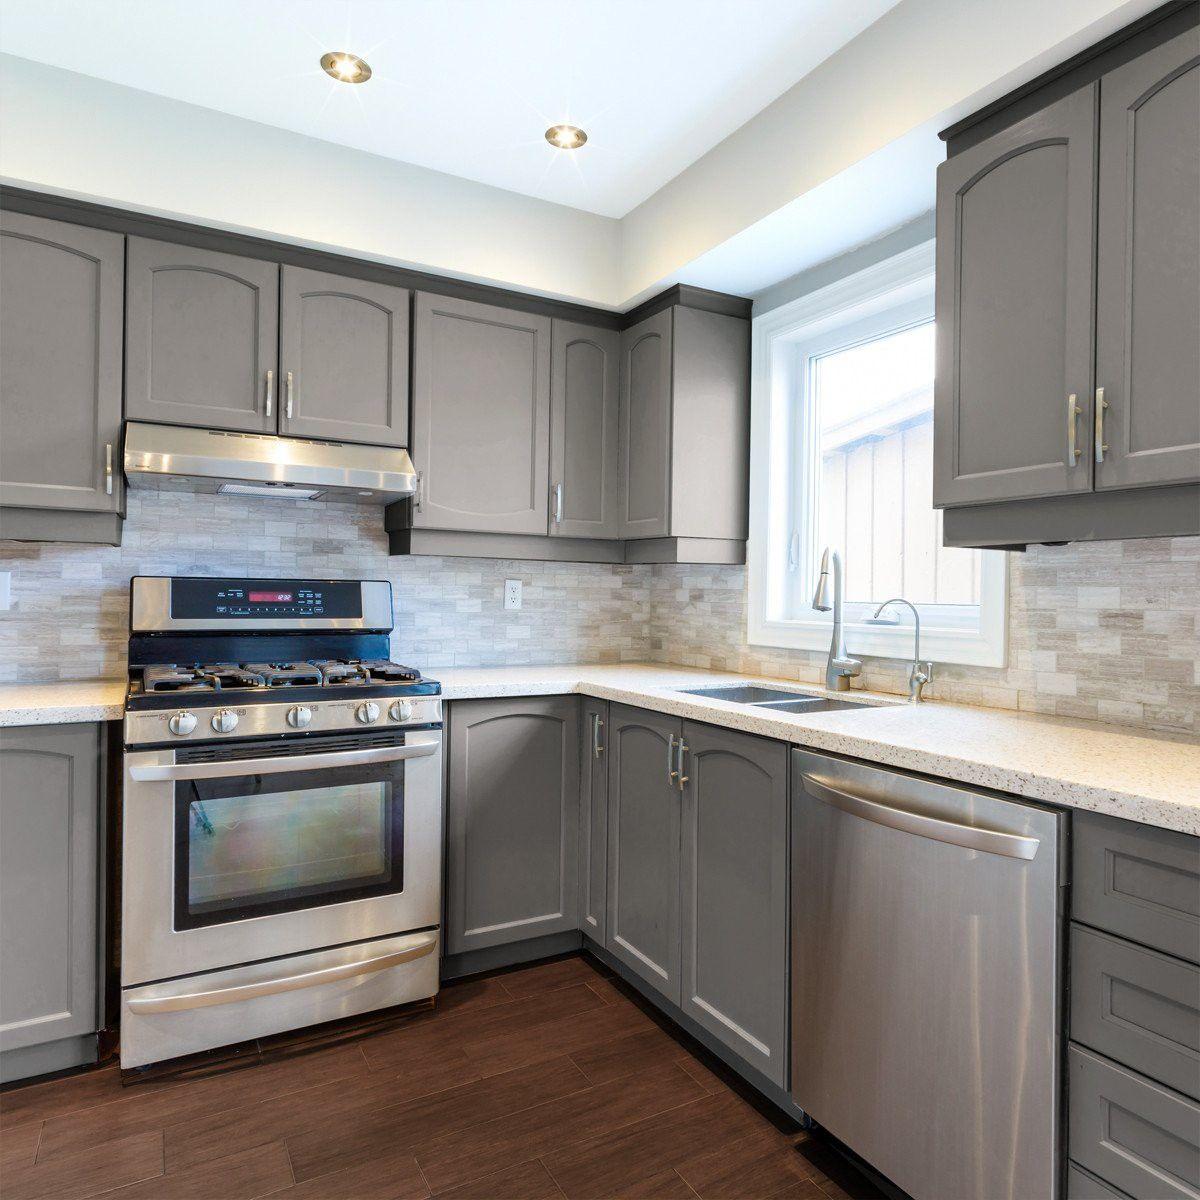 Lovely Kitchen Cabinet Paint Kit Kitchen Cabinet Remodel Kitchen Remodel Small Interior Design Kitchen